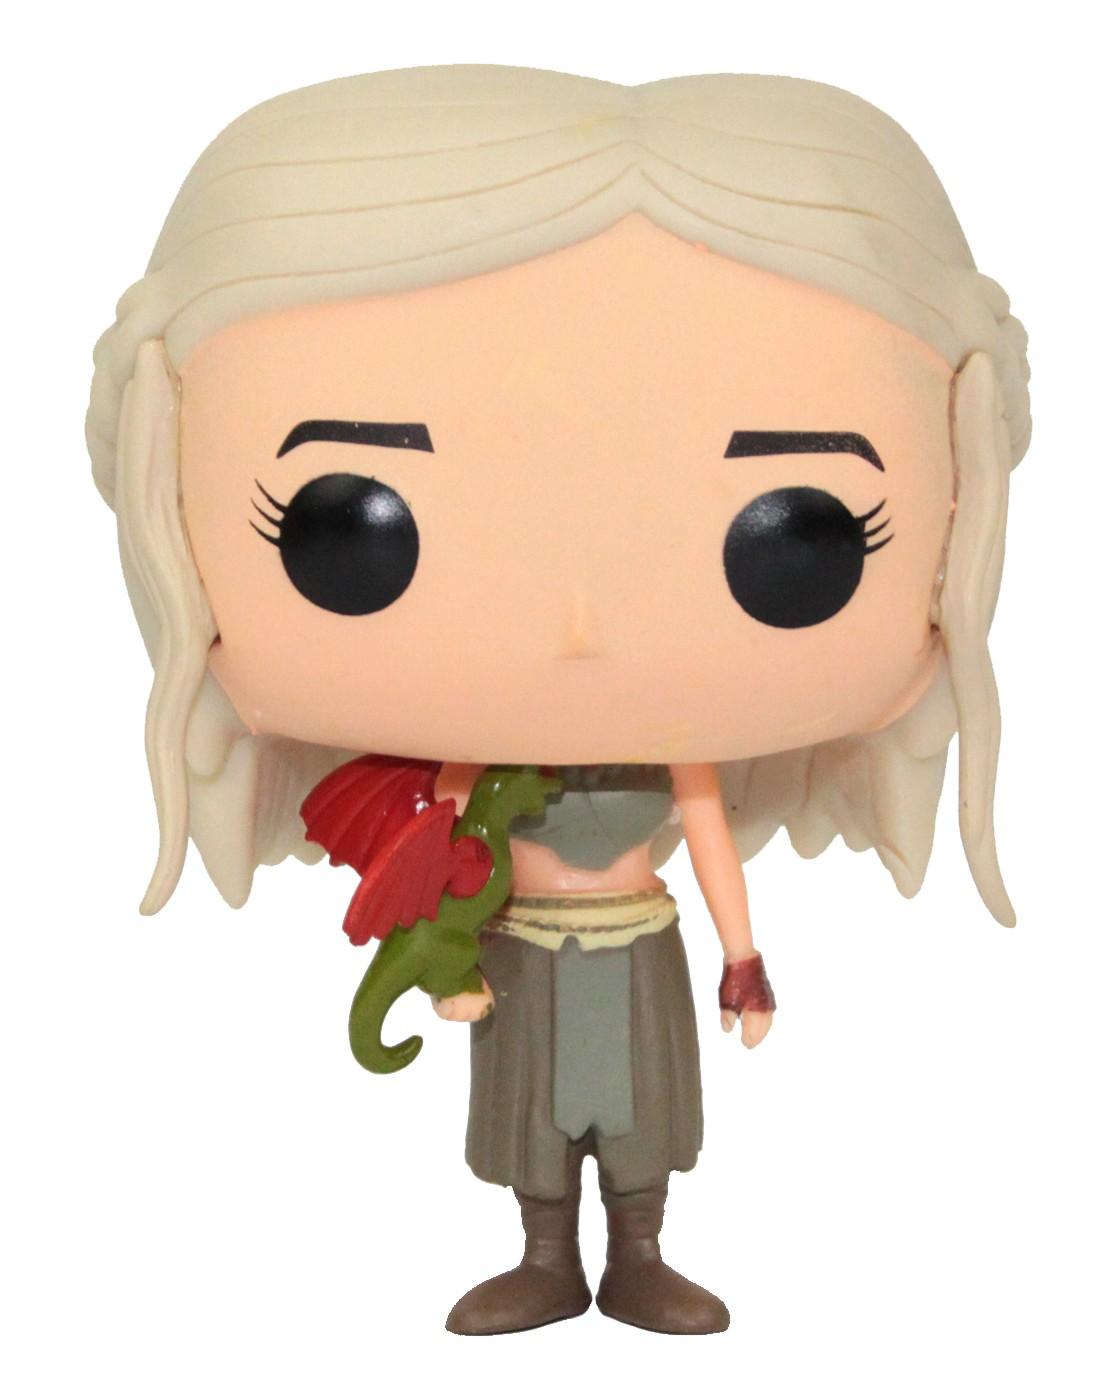 Daenerys Targaryen Vinyl Figure Item #3012 Funko Pop Game of Thrones™